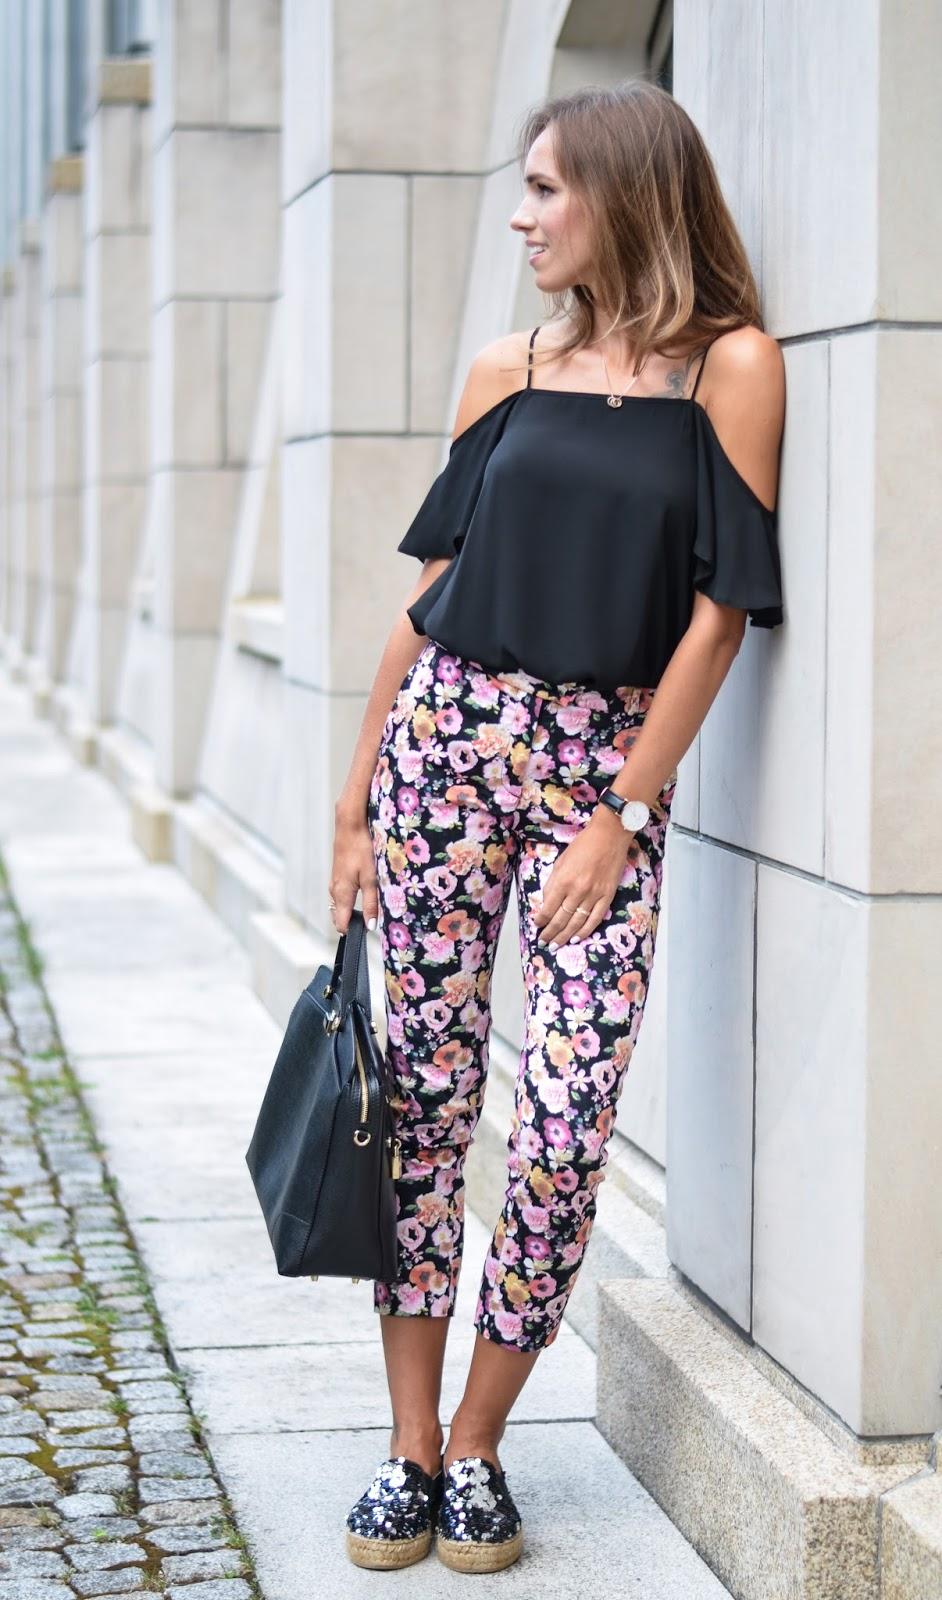 kristjaana mere munich street style summer 2015 trend outfit